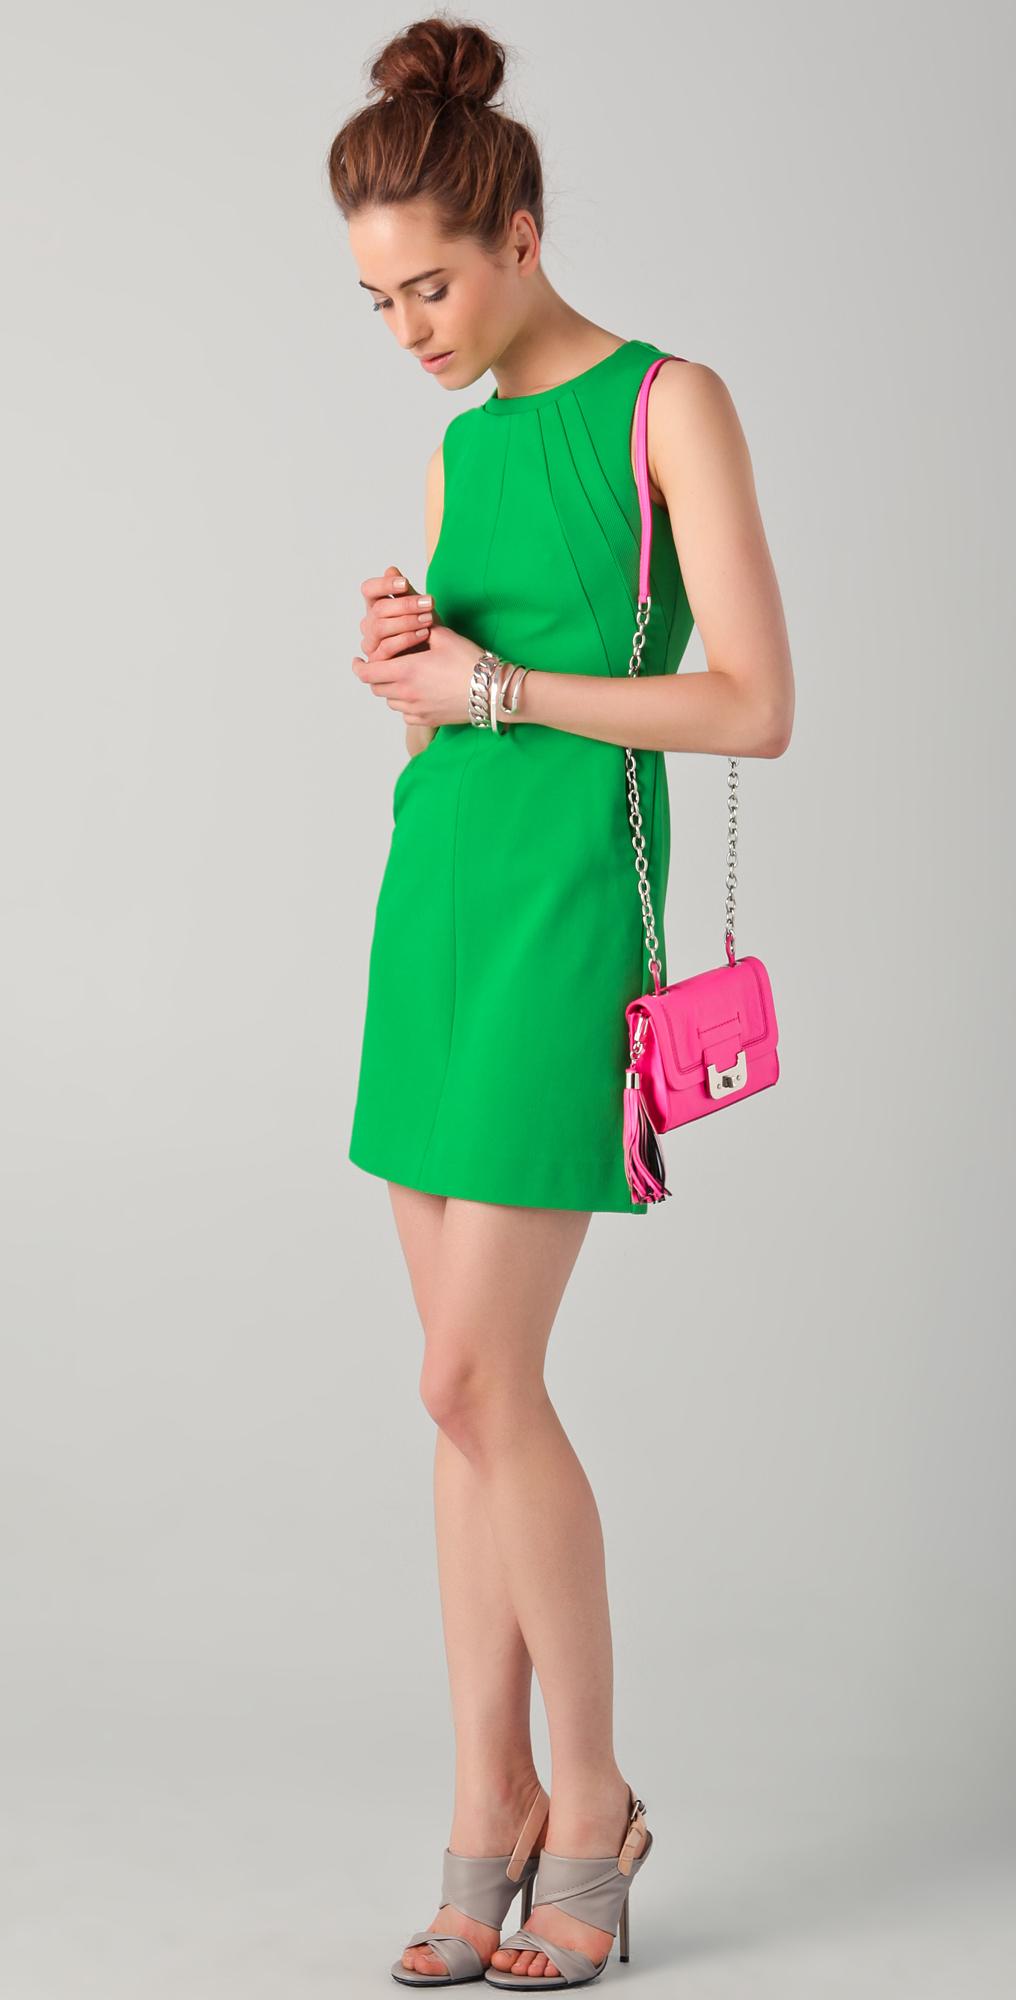 Carpreena dress Diane Von F Clearance Best Seller Latest mqV5C